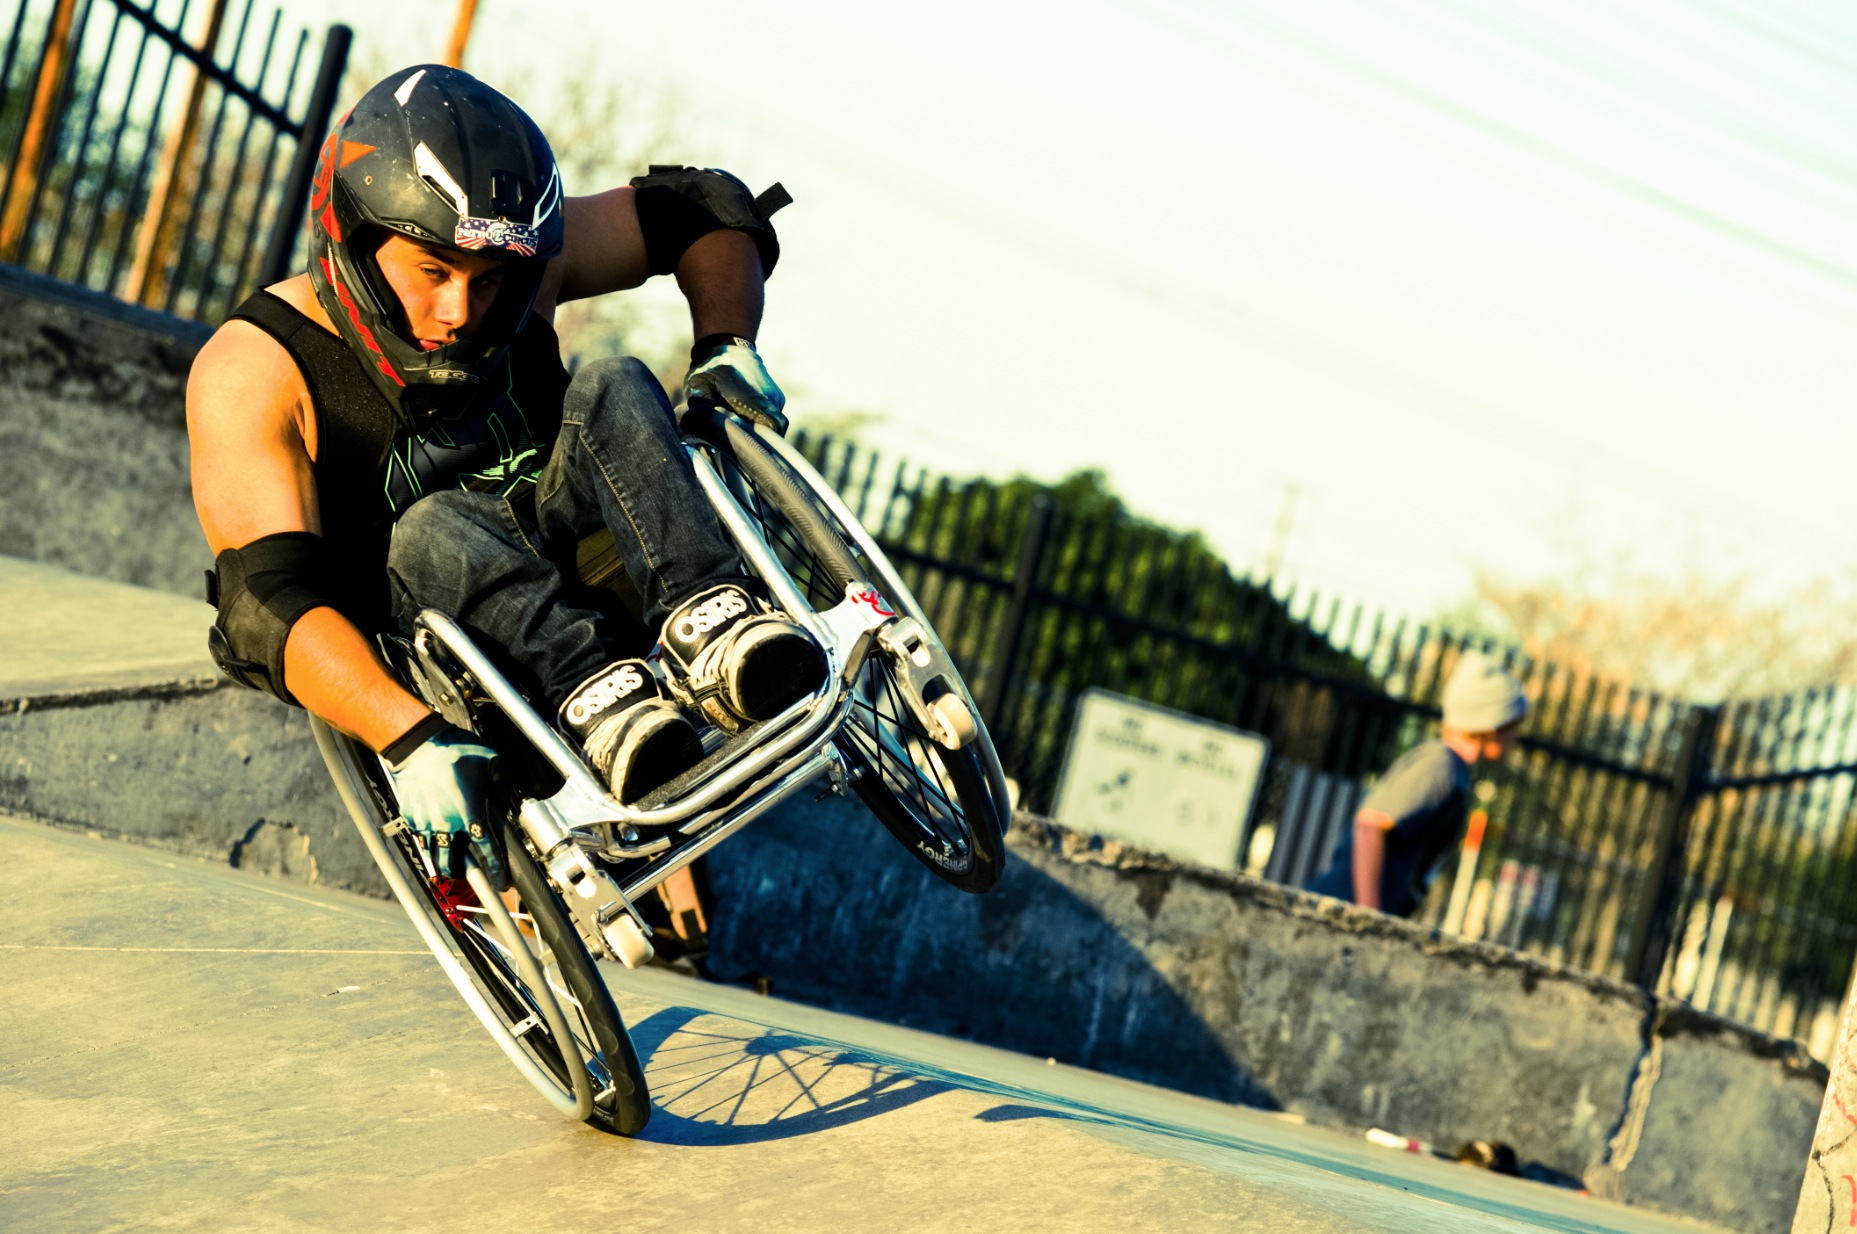 disability awareness activities begin sept 28 with